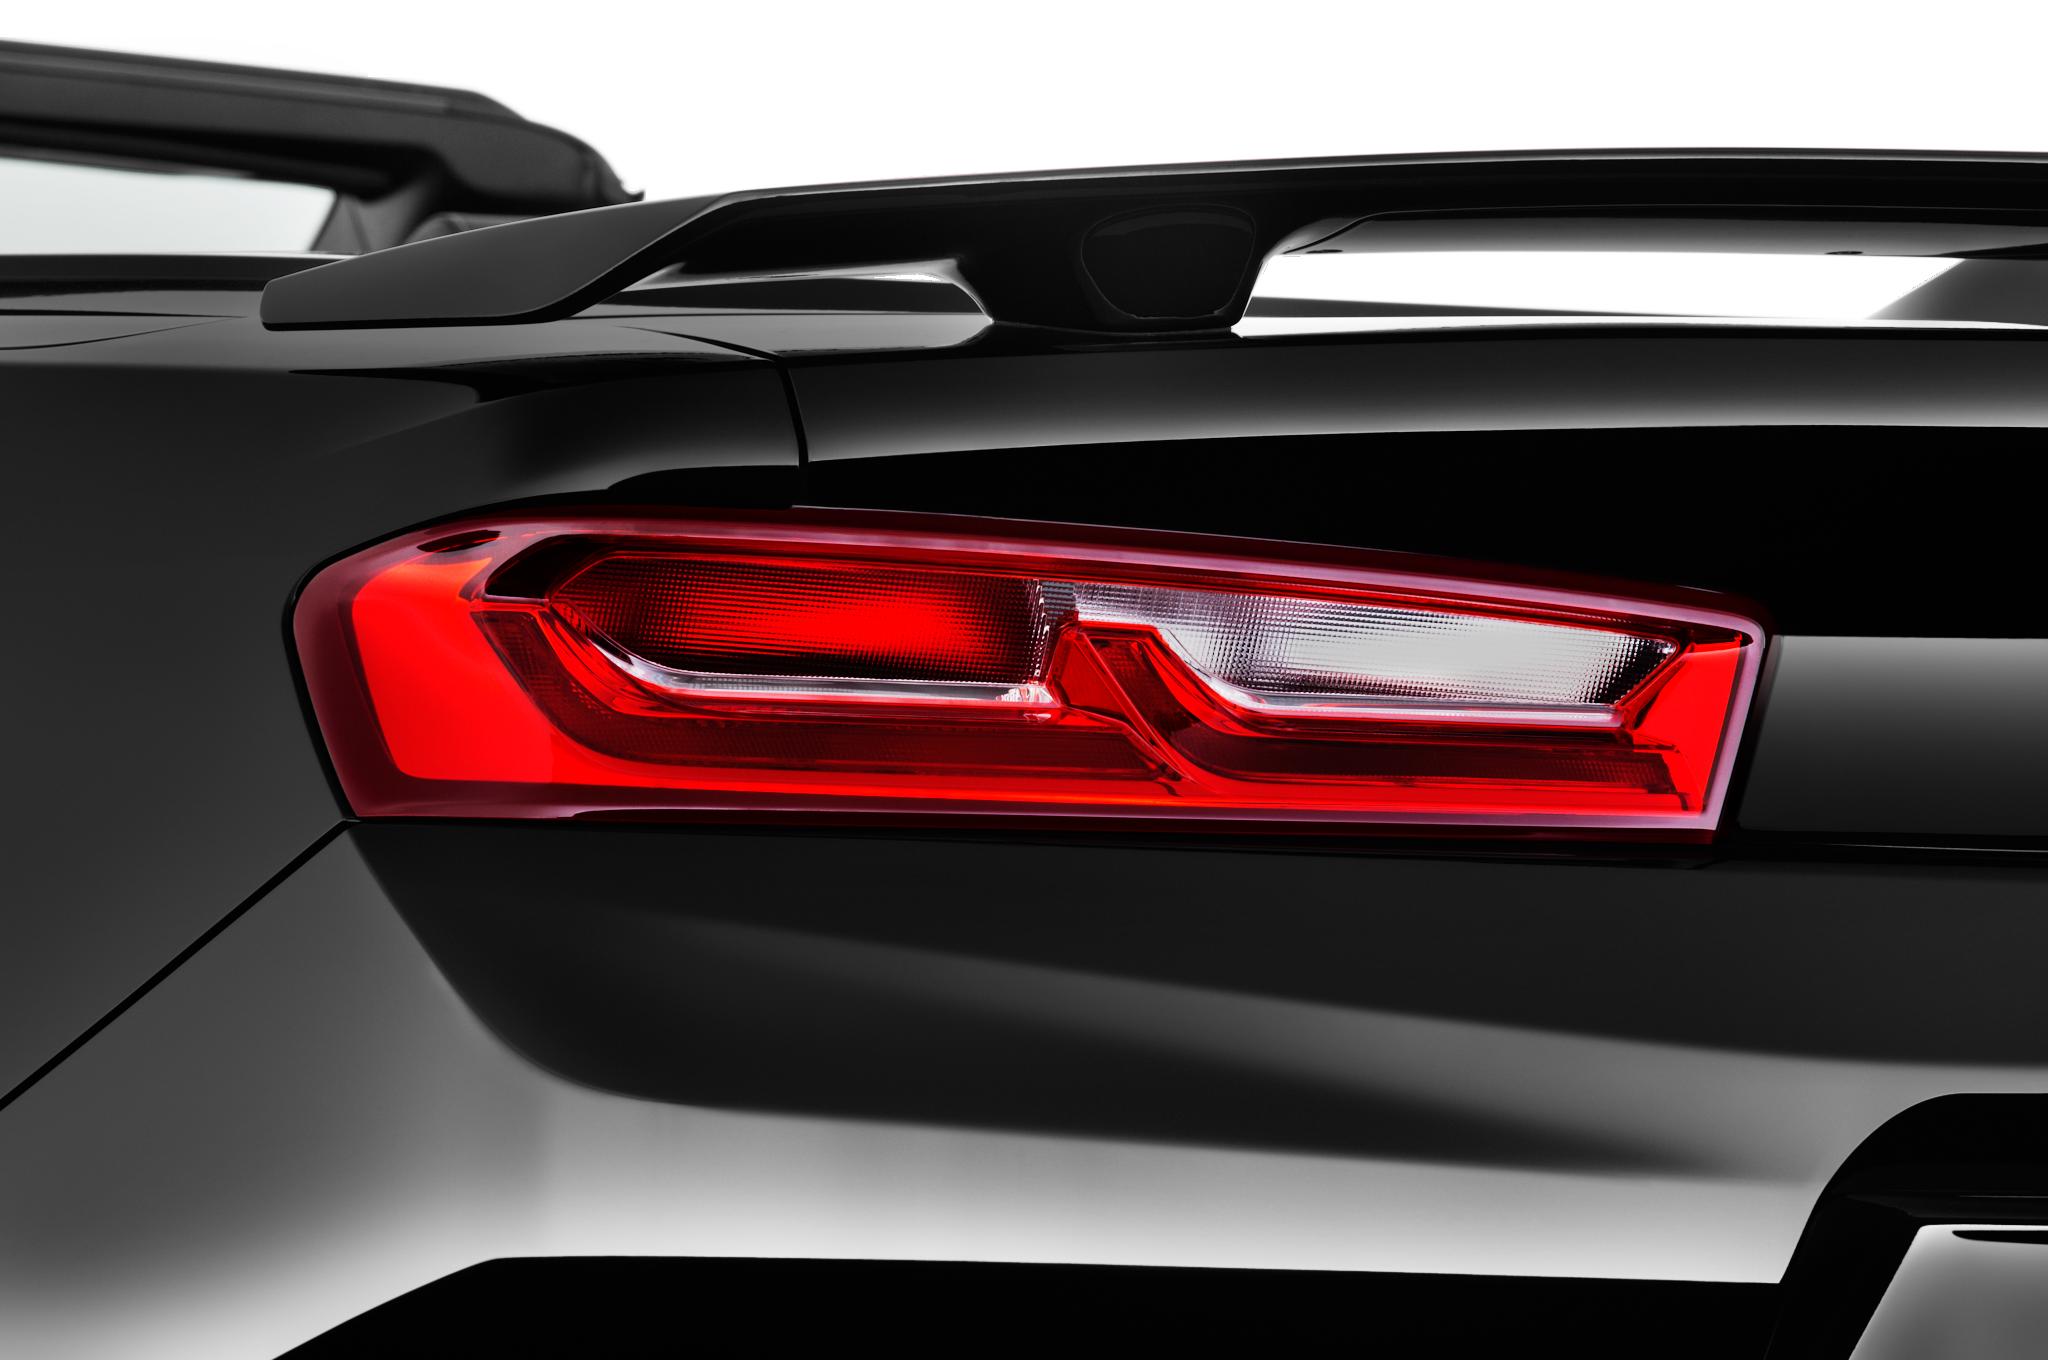 Chevrolet Camaro Lt Convertible Taillight